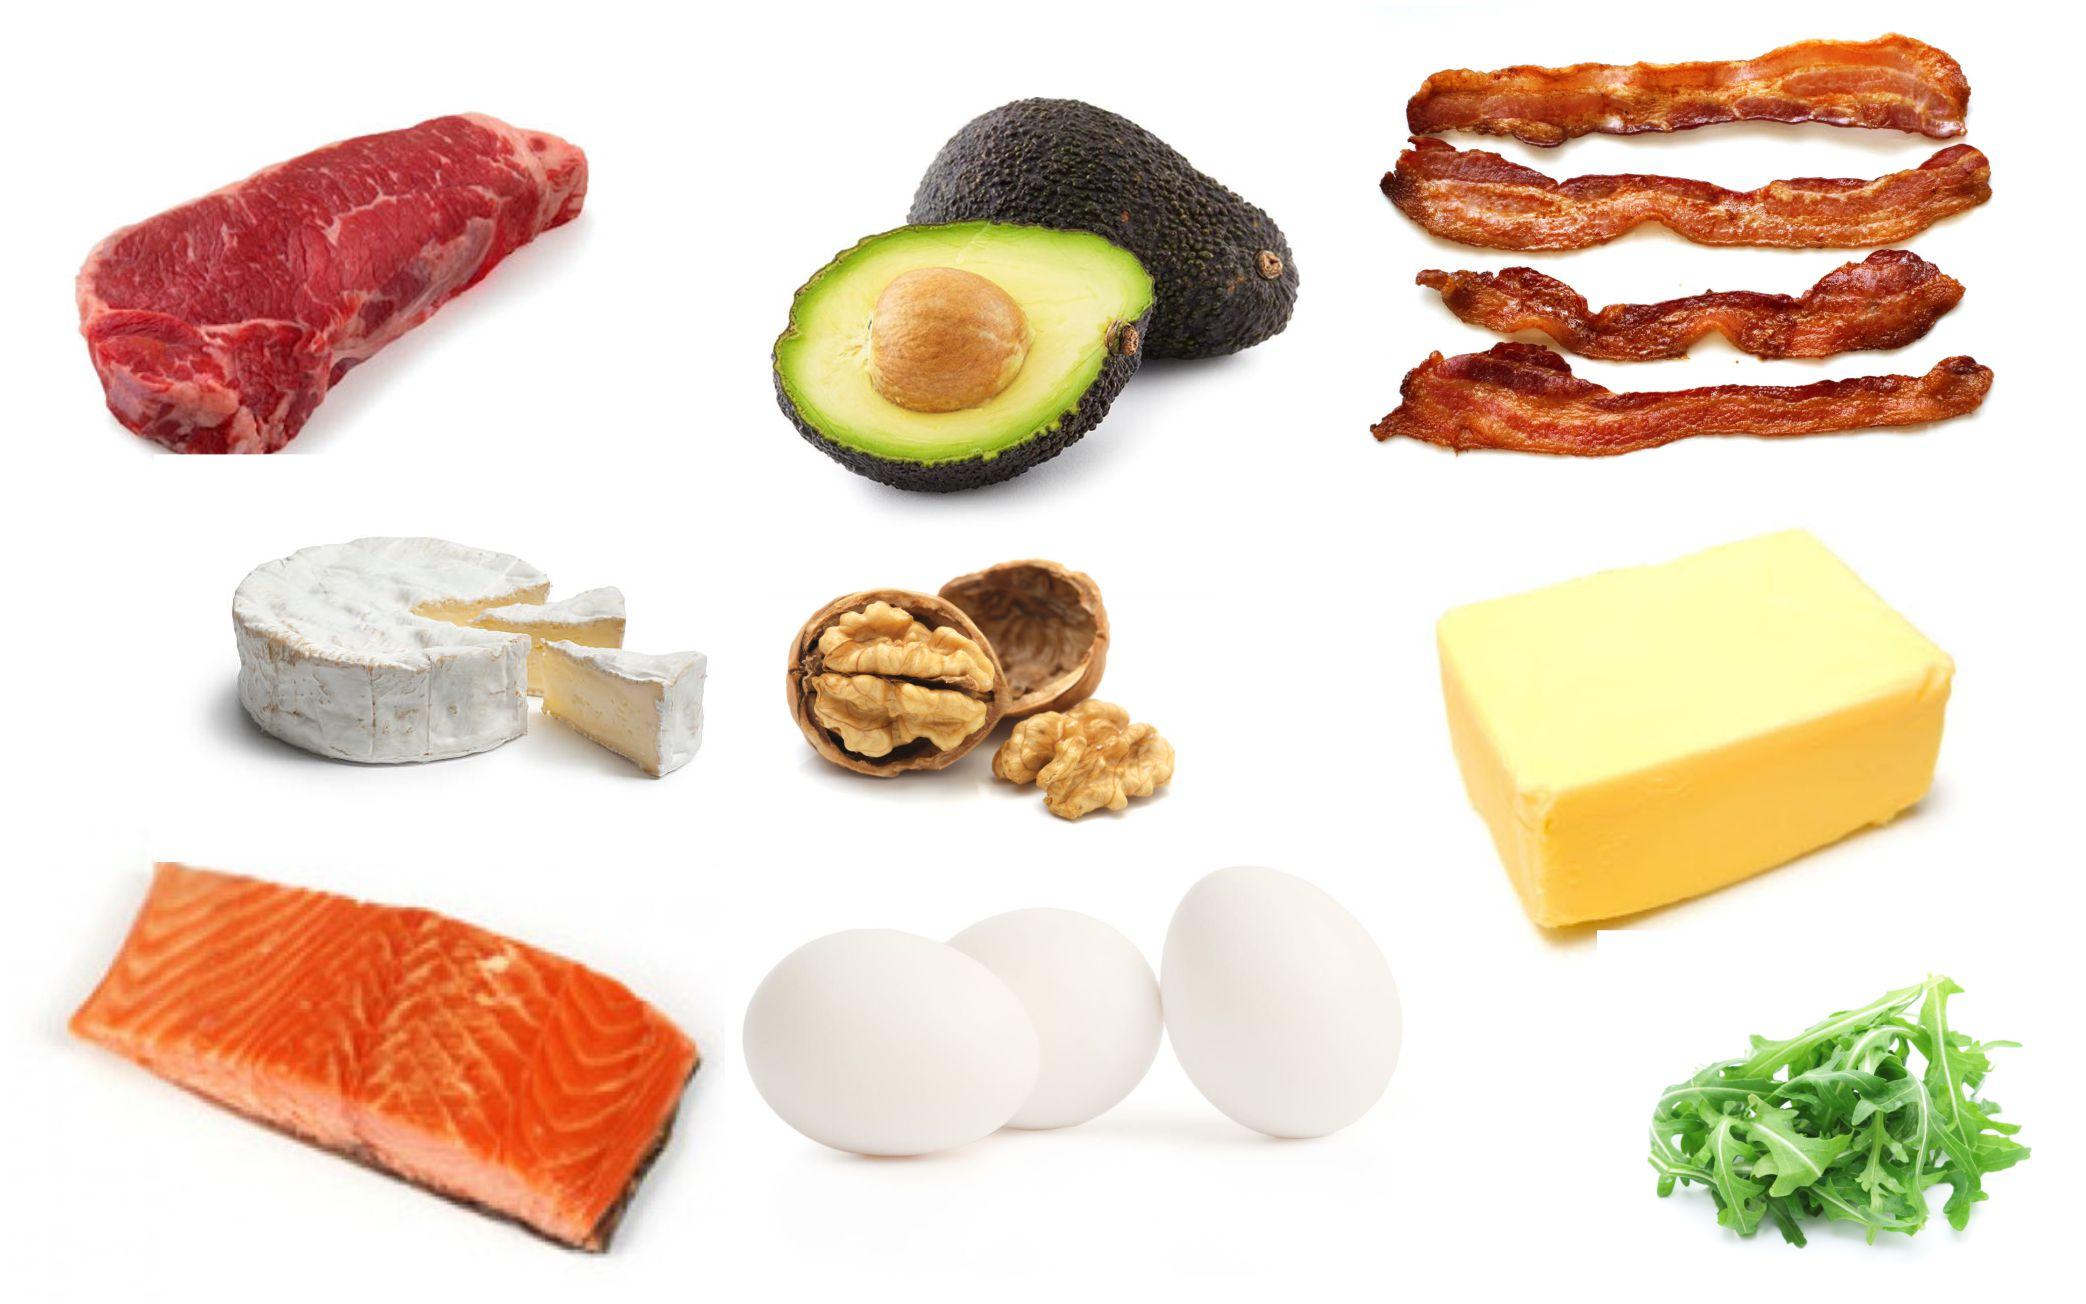 marhahús jó a fogyáshoz)